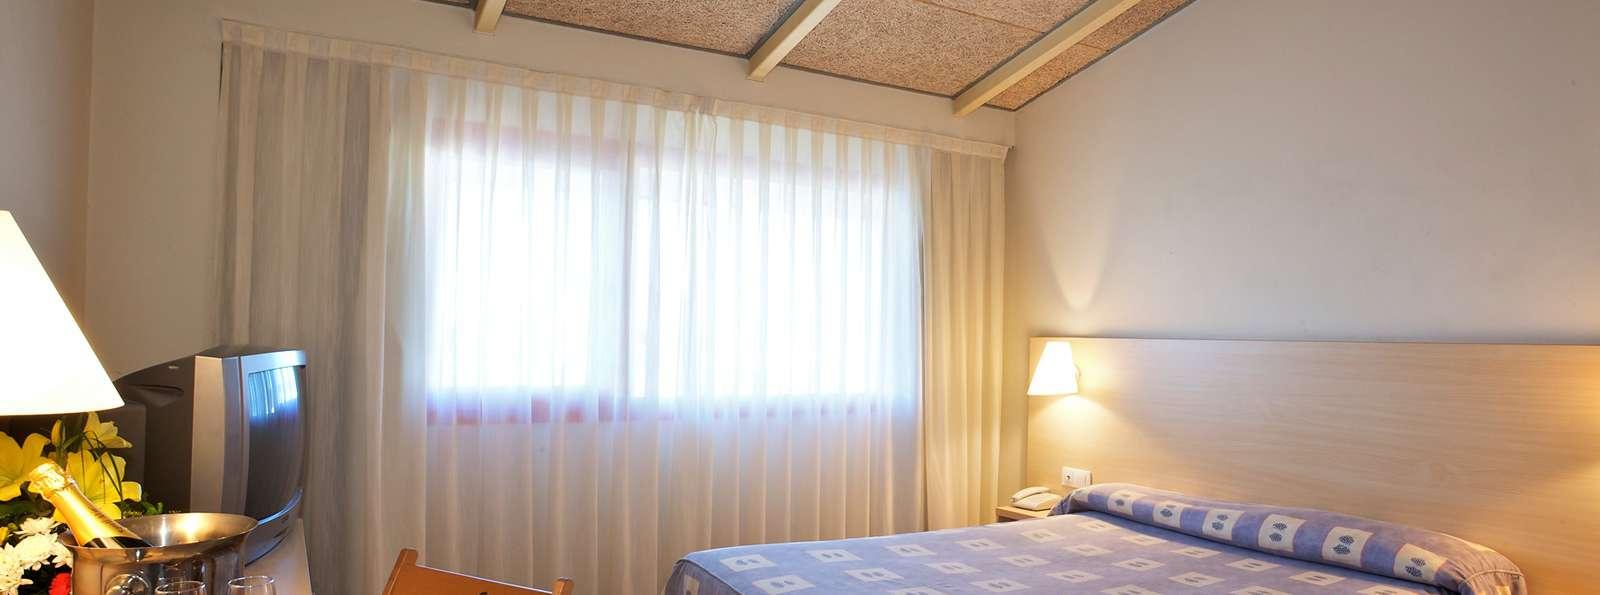 Basic Hotel - Chambre standard